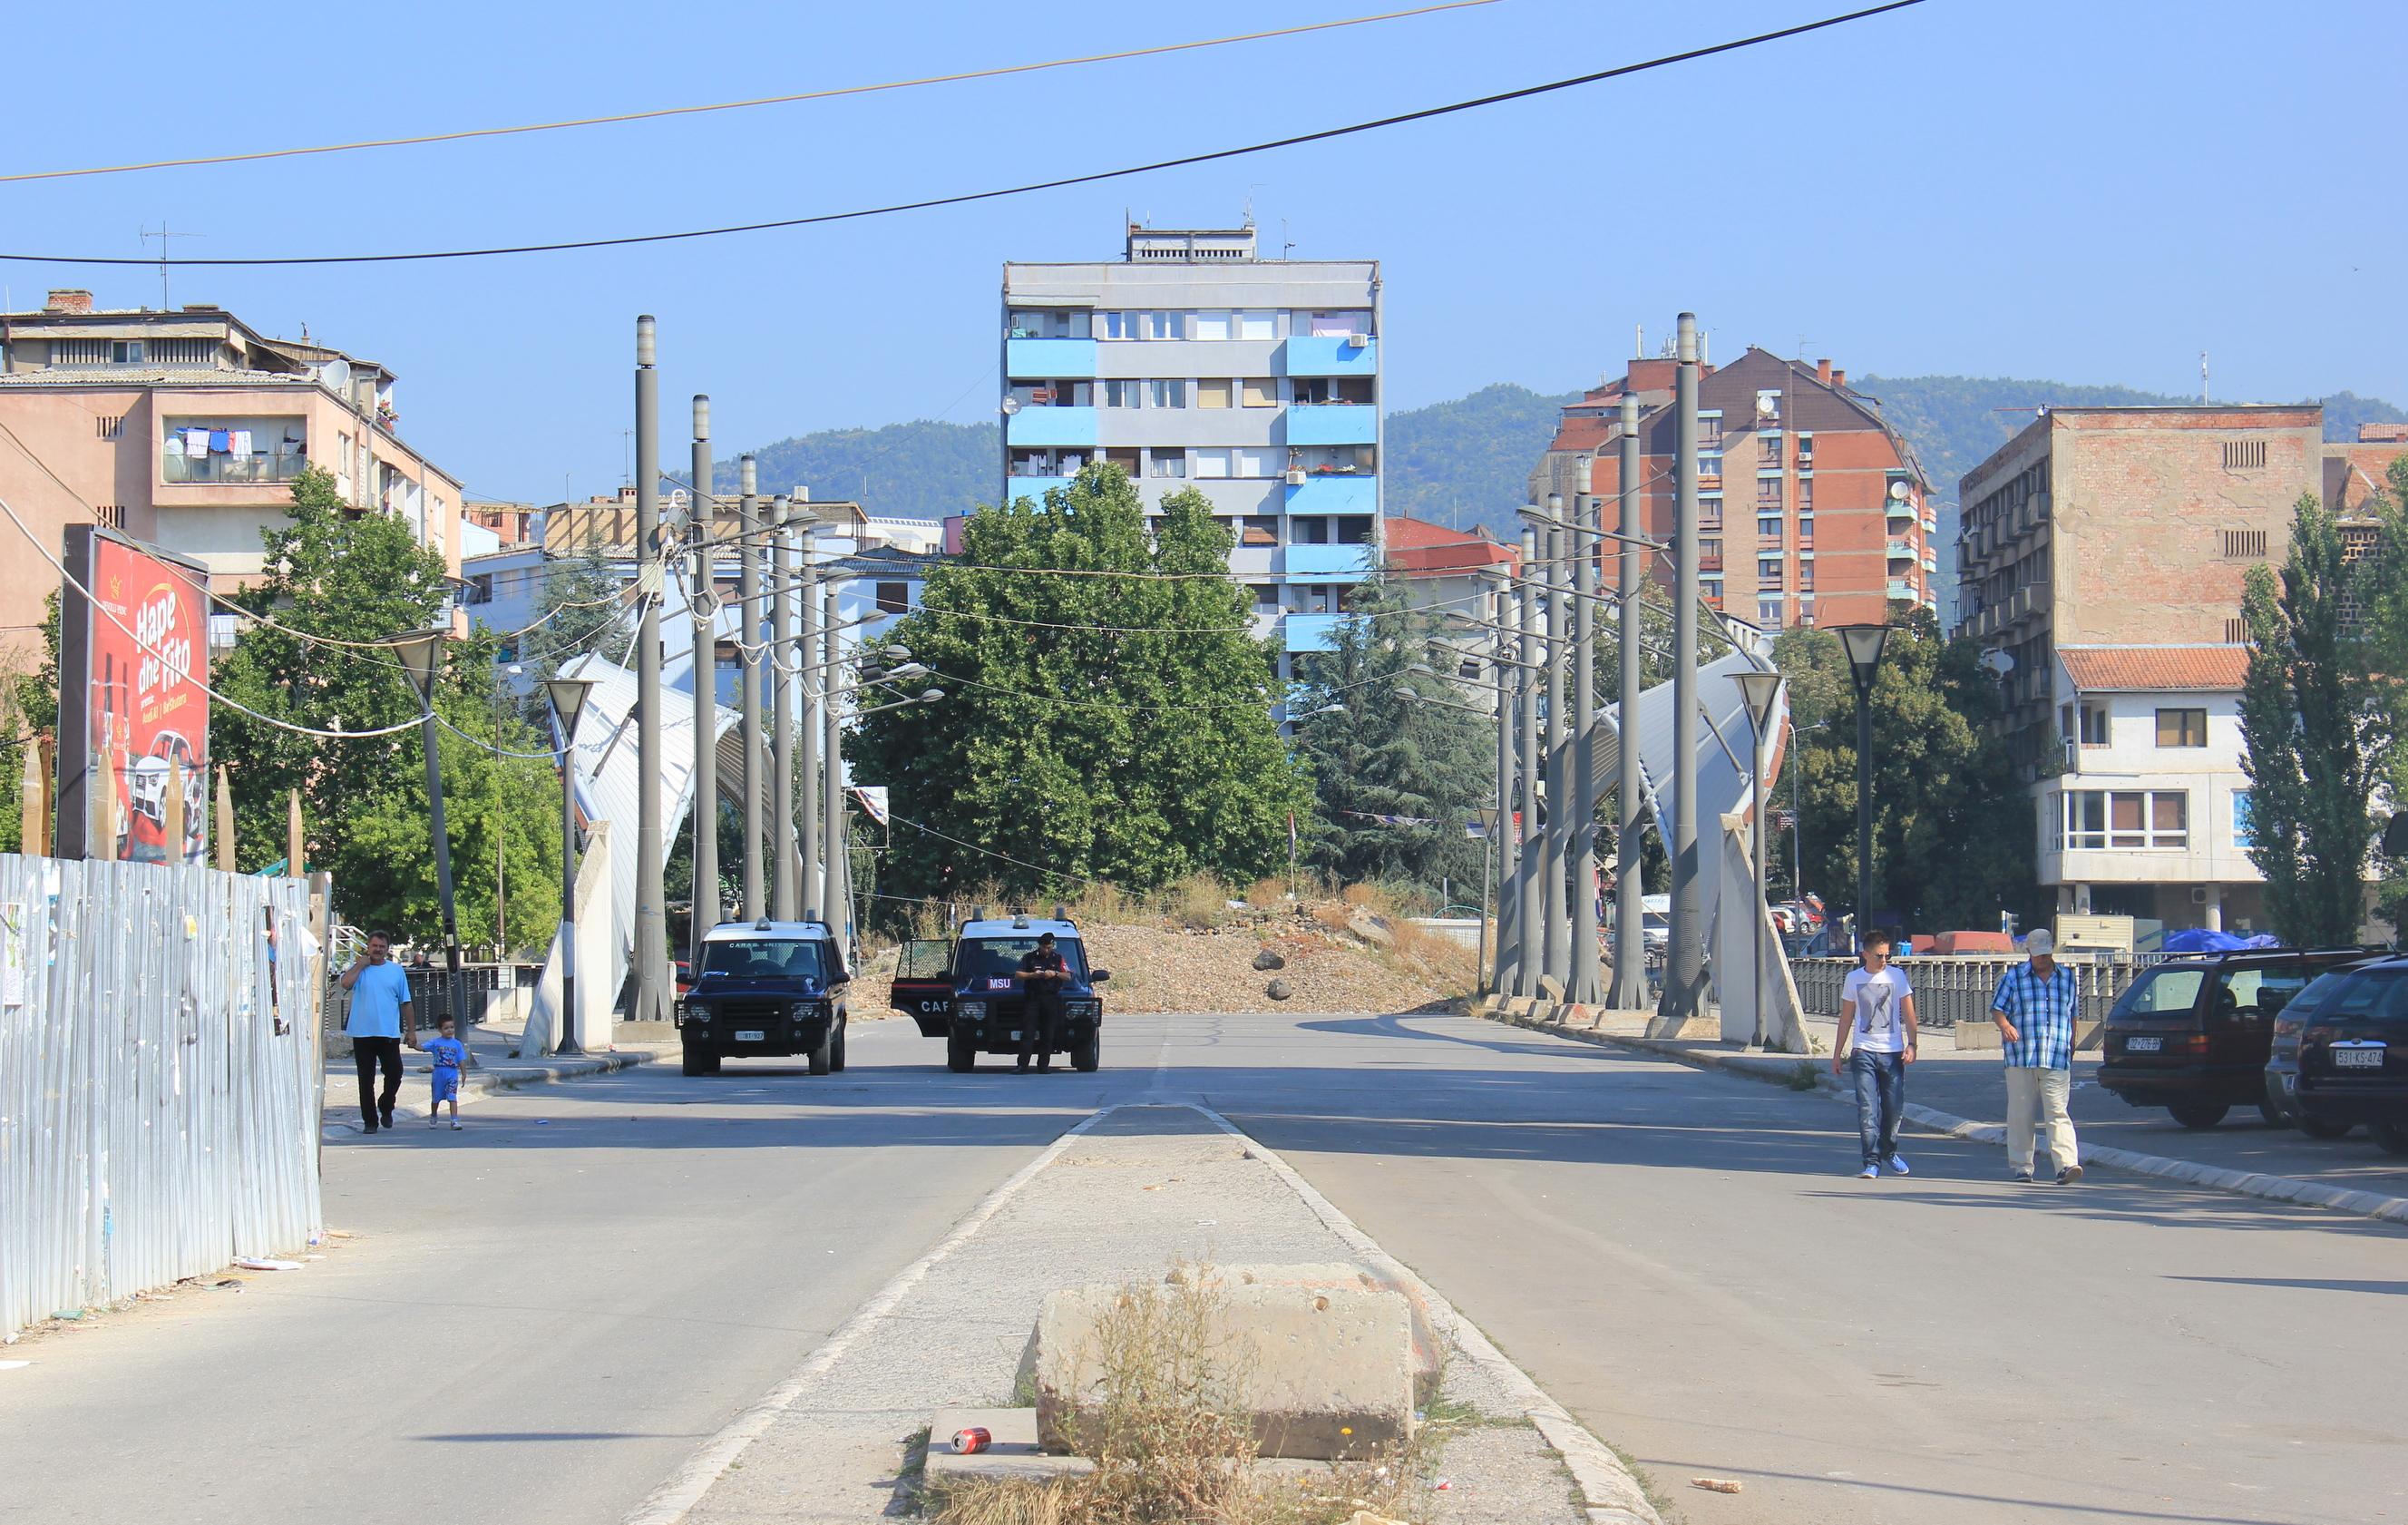 File:Mitrovica Bridge 2.JPG - Wikimedia Commons